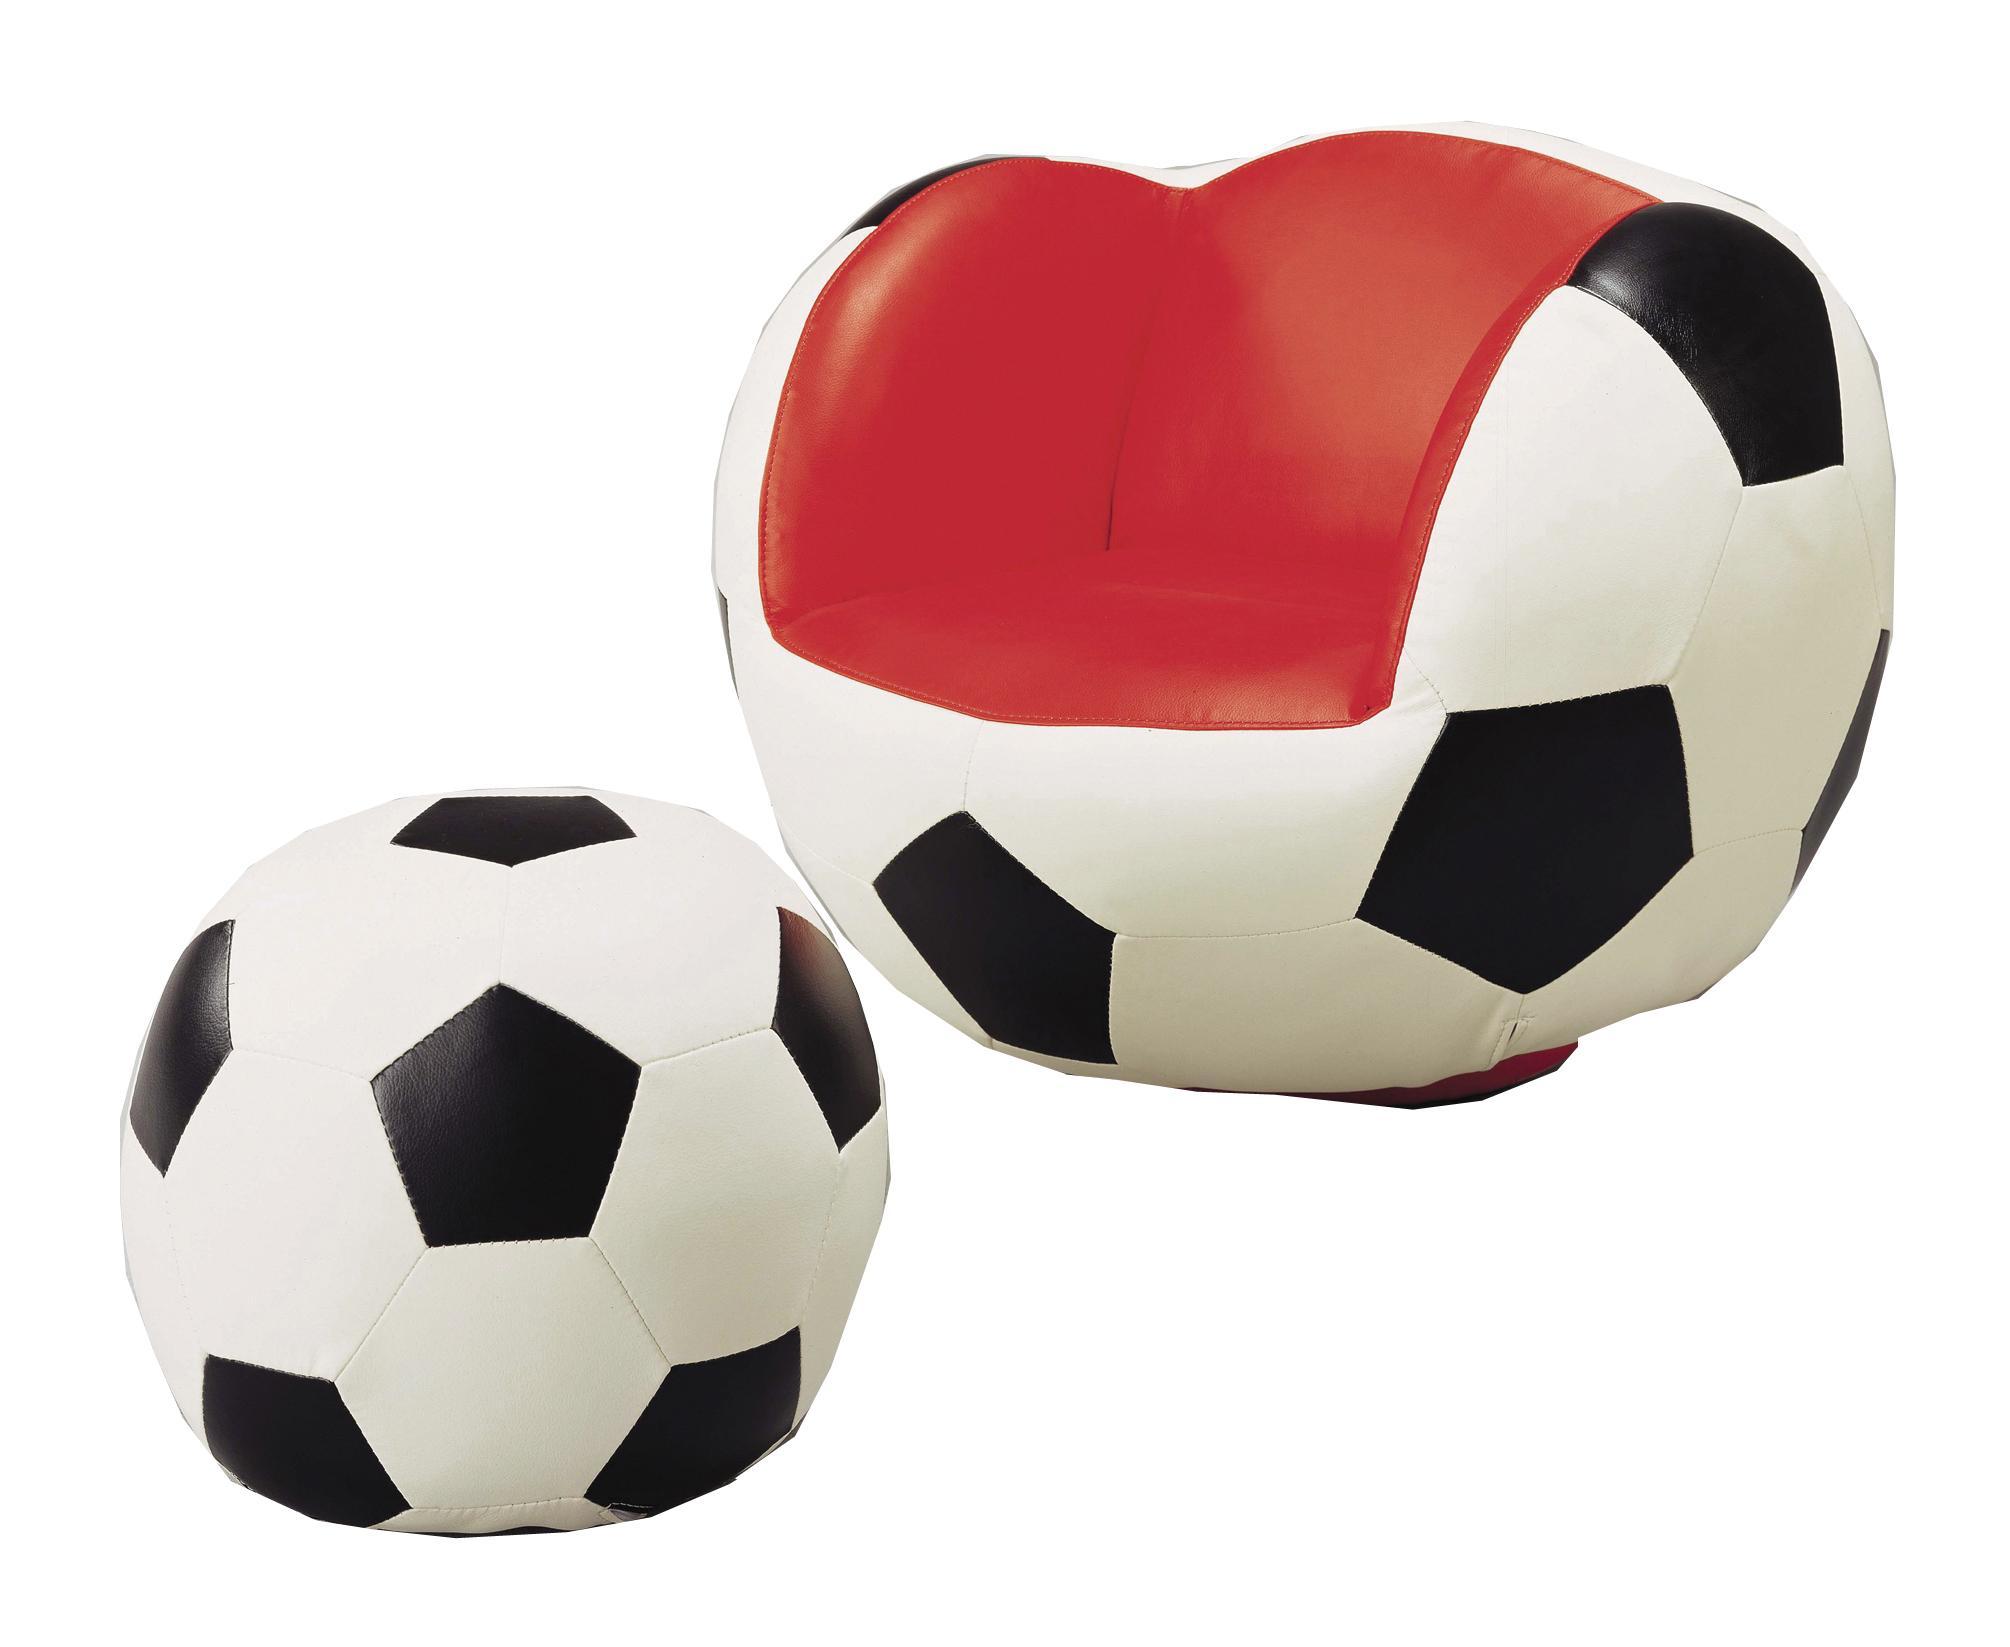 Belfort Essentials Kids Sport Chairs Soccer Swivel Chair U0026 Ottoman